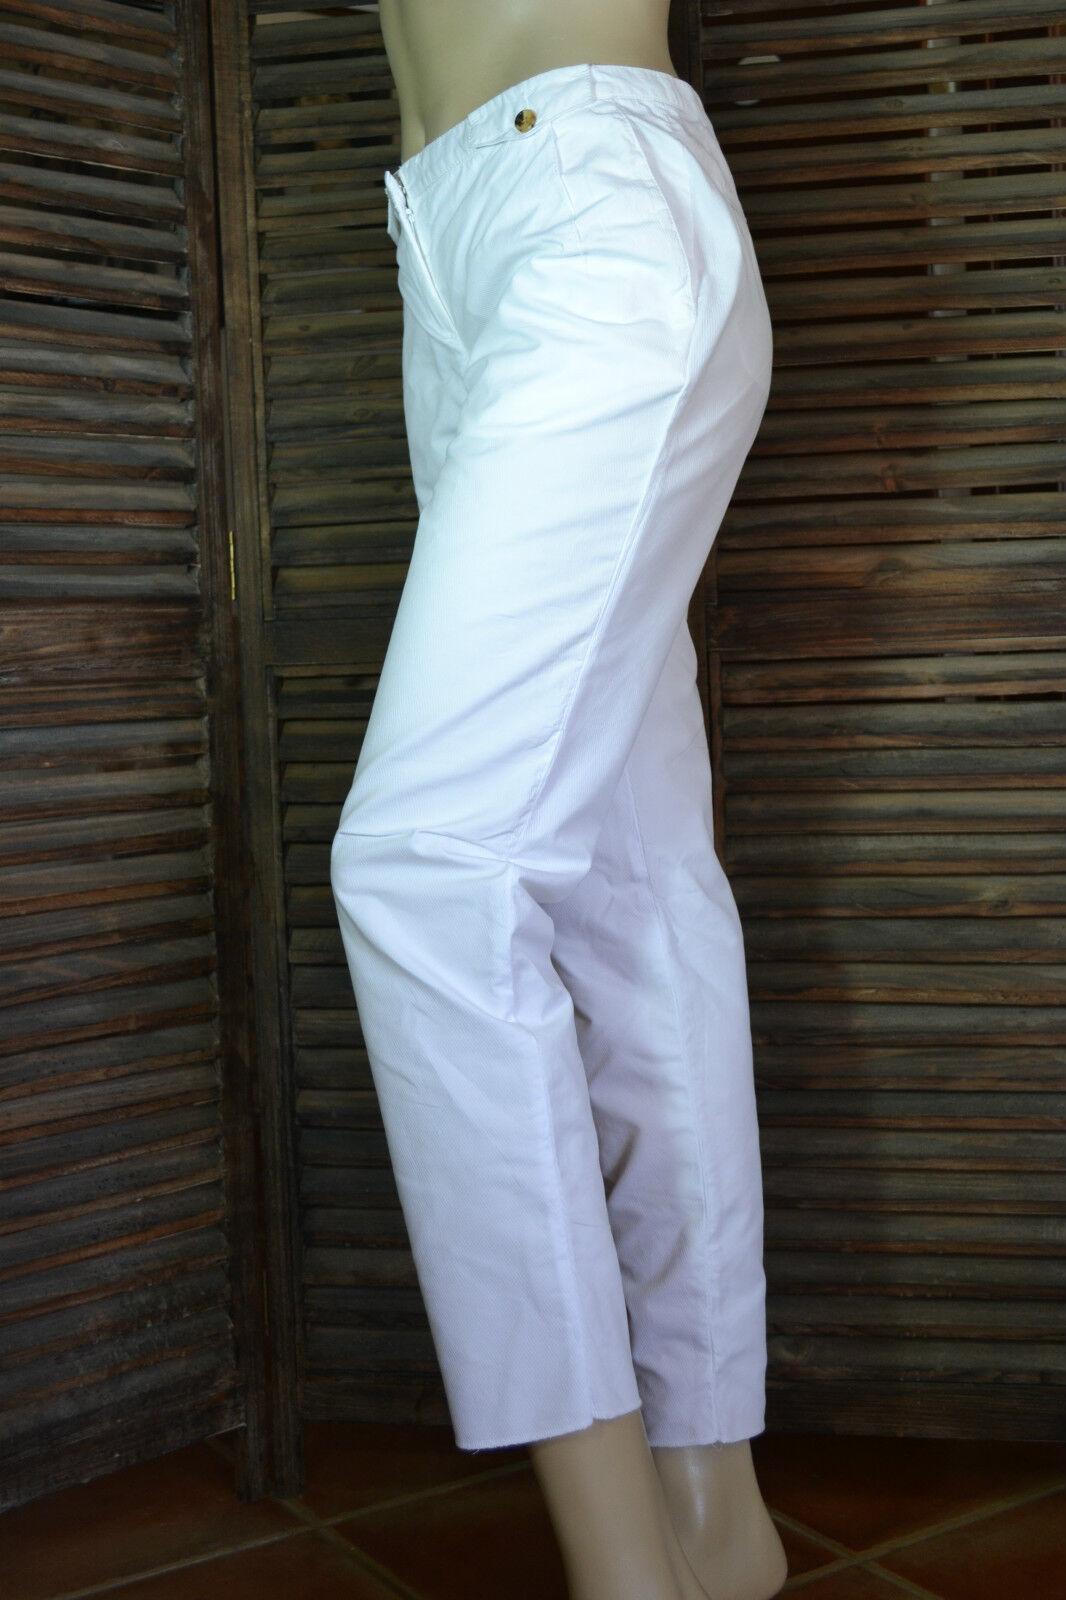 VIKTOR & ROLF Hose weiß trousers pantalon NEU Gr. 42 44 NEW  weiß